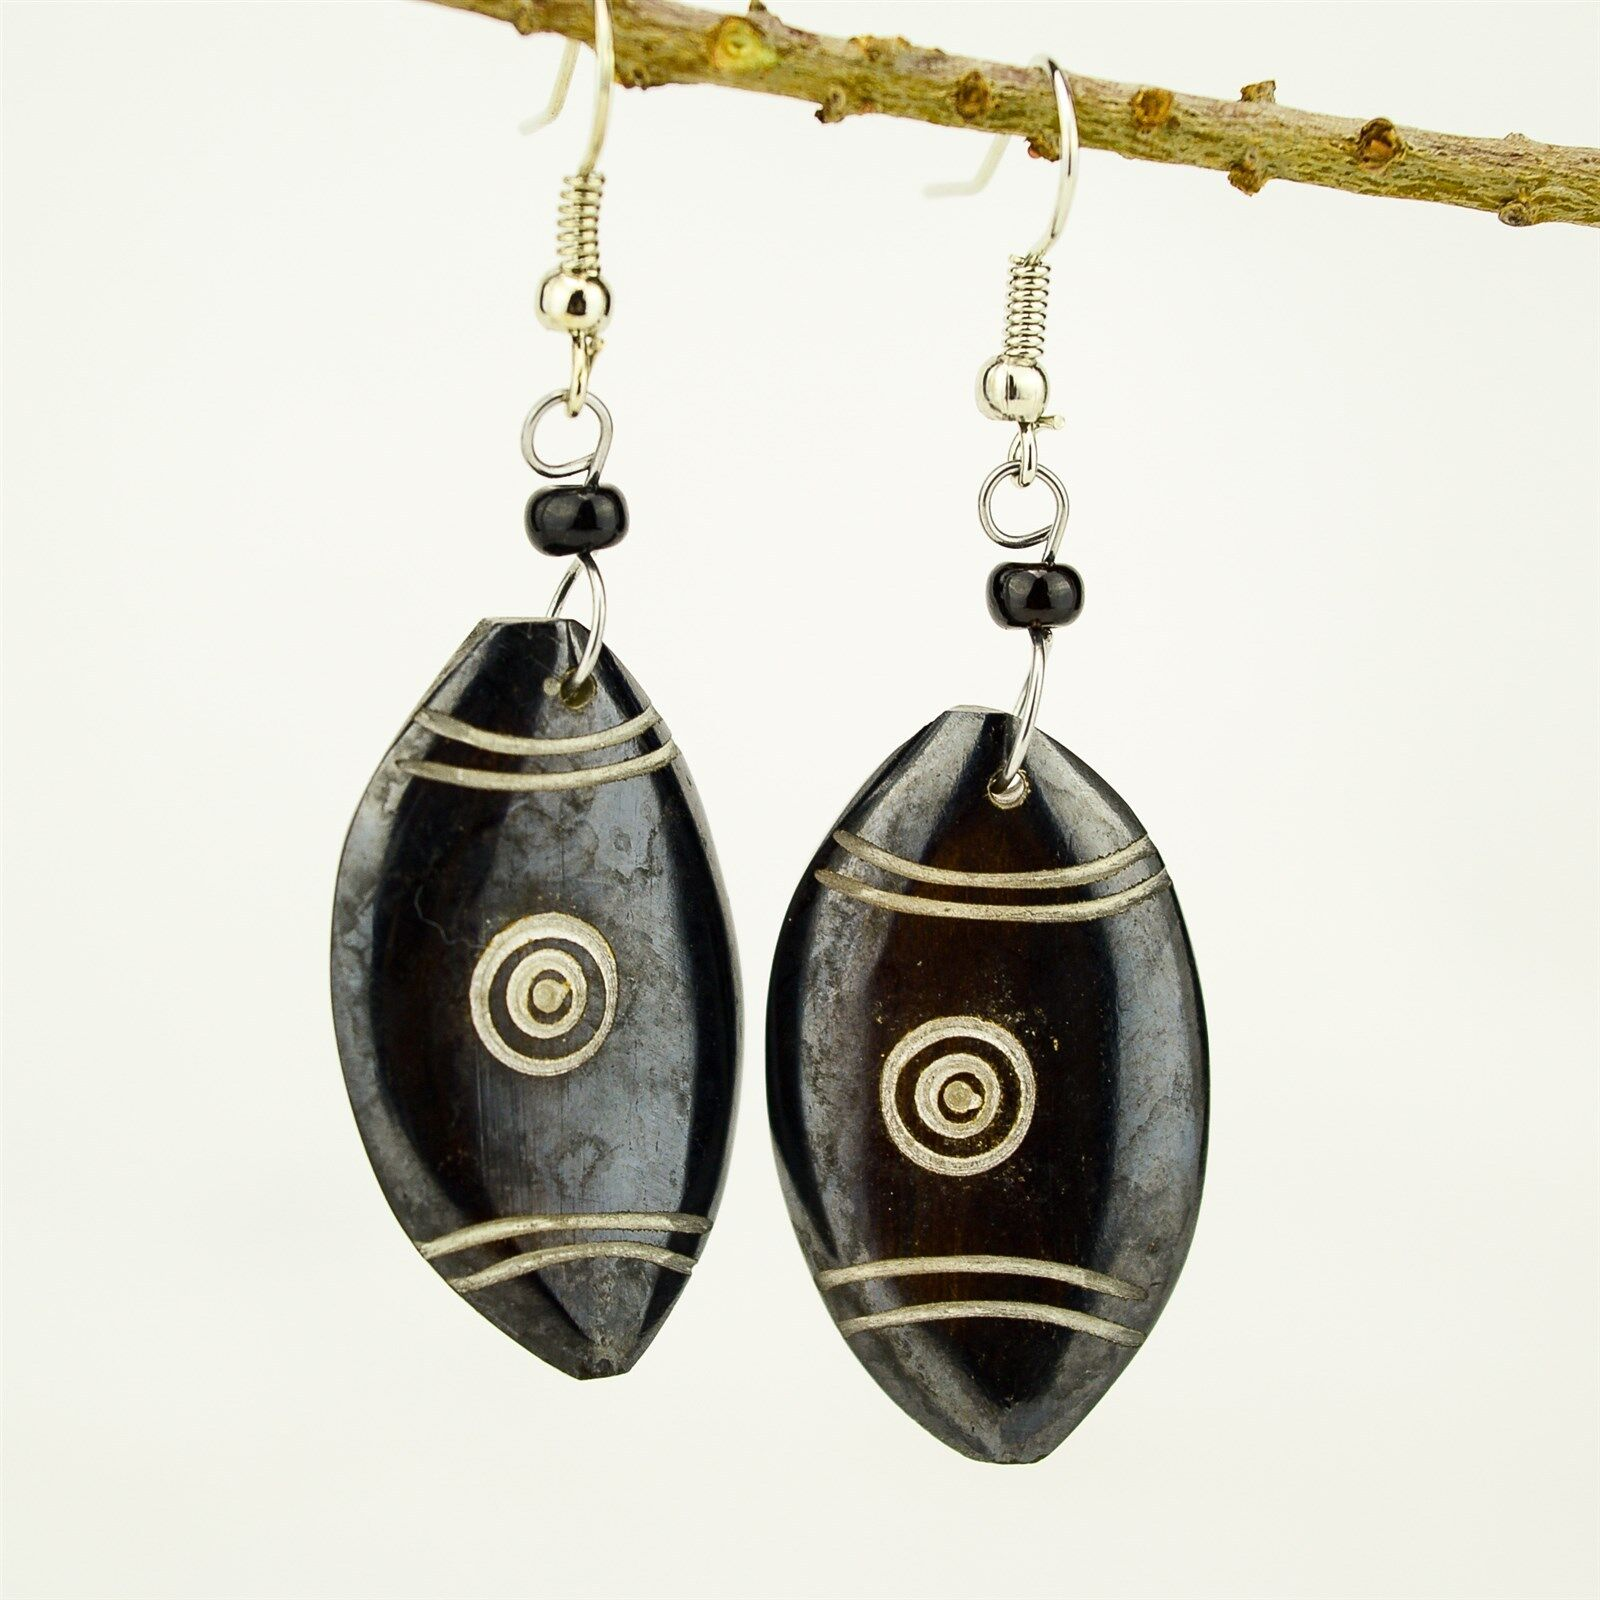 Details about Handmade African Jewelry Maasai Shield Shaped Brown Bone  earrings 487-134